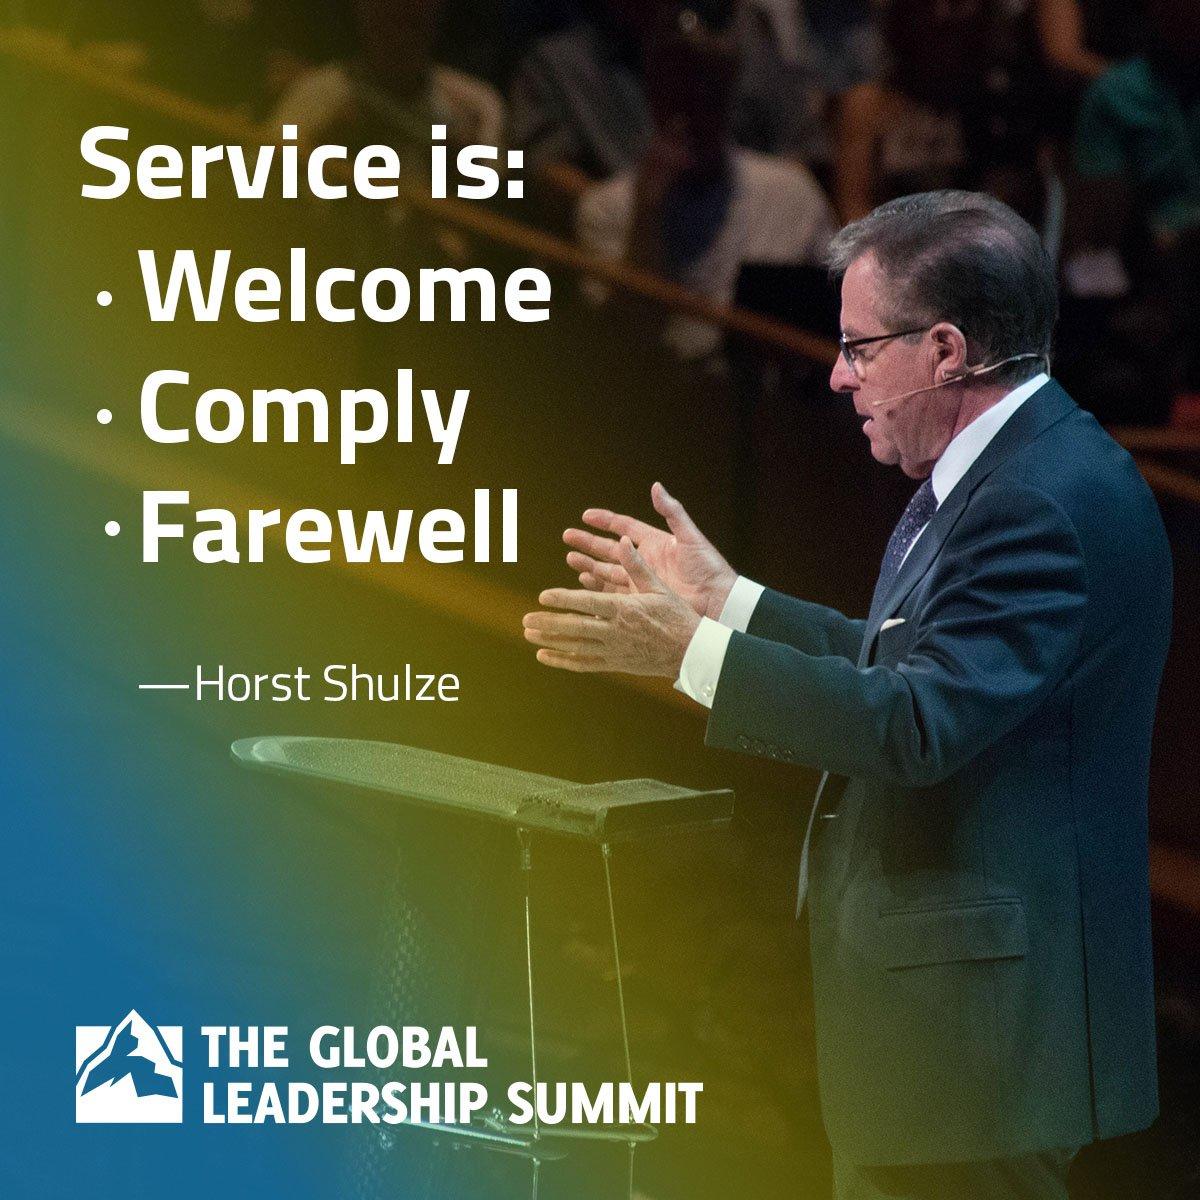 Global Leadership Network on Twitter: